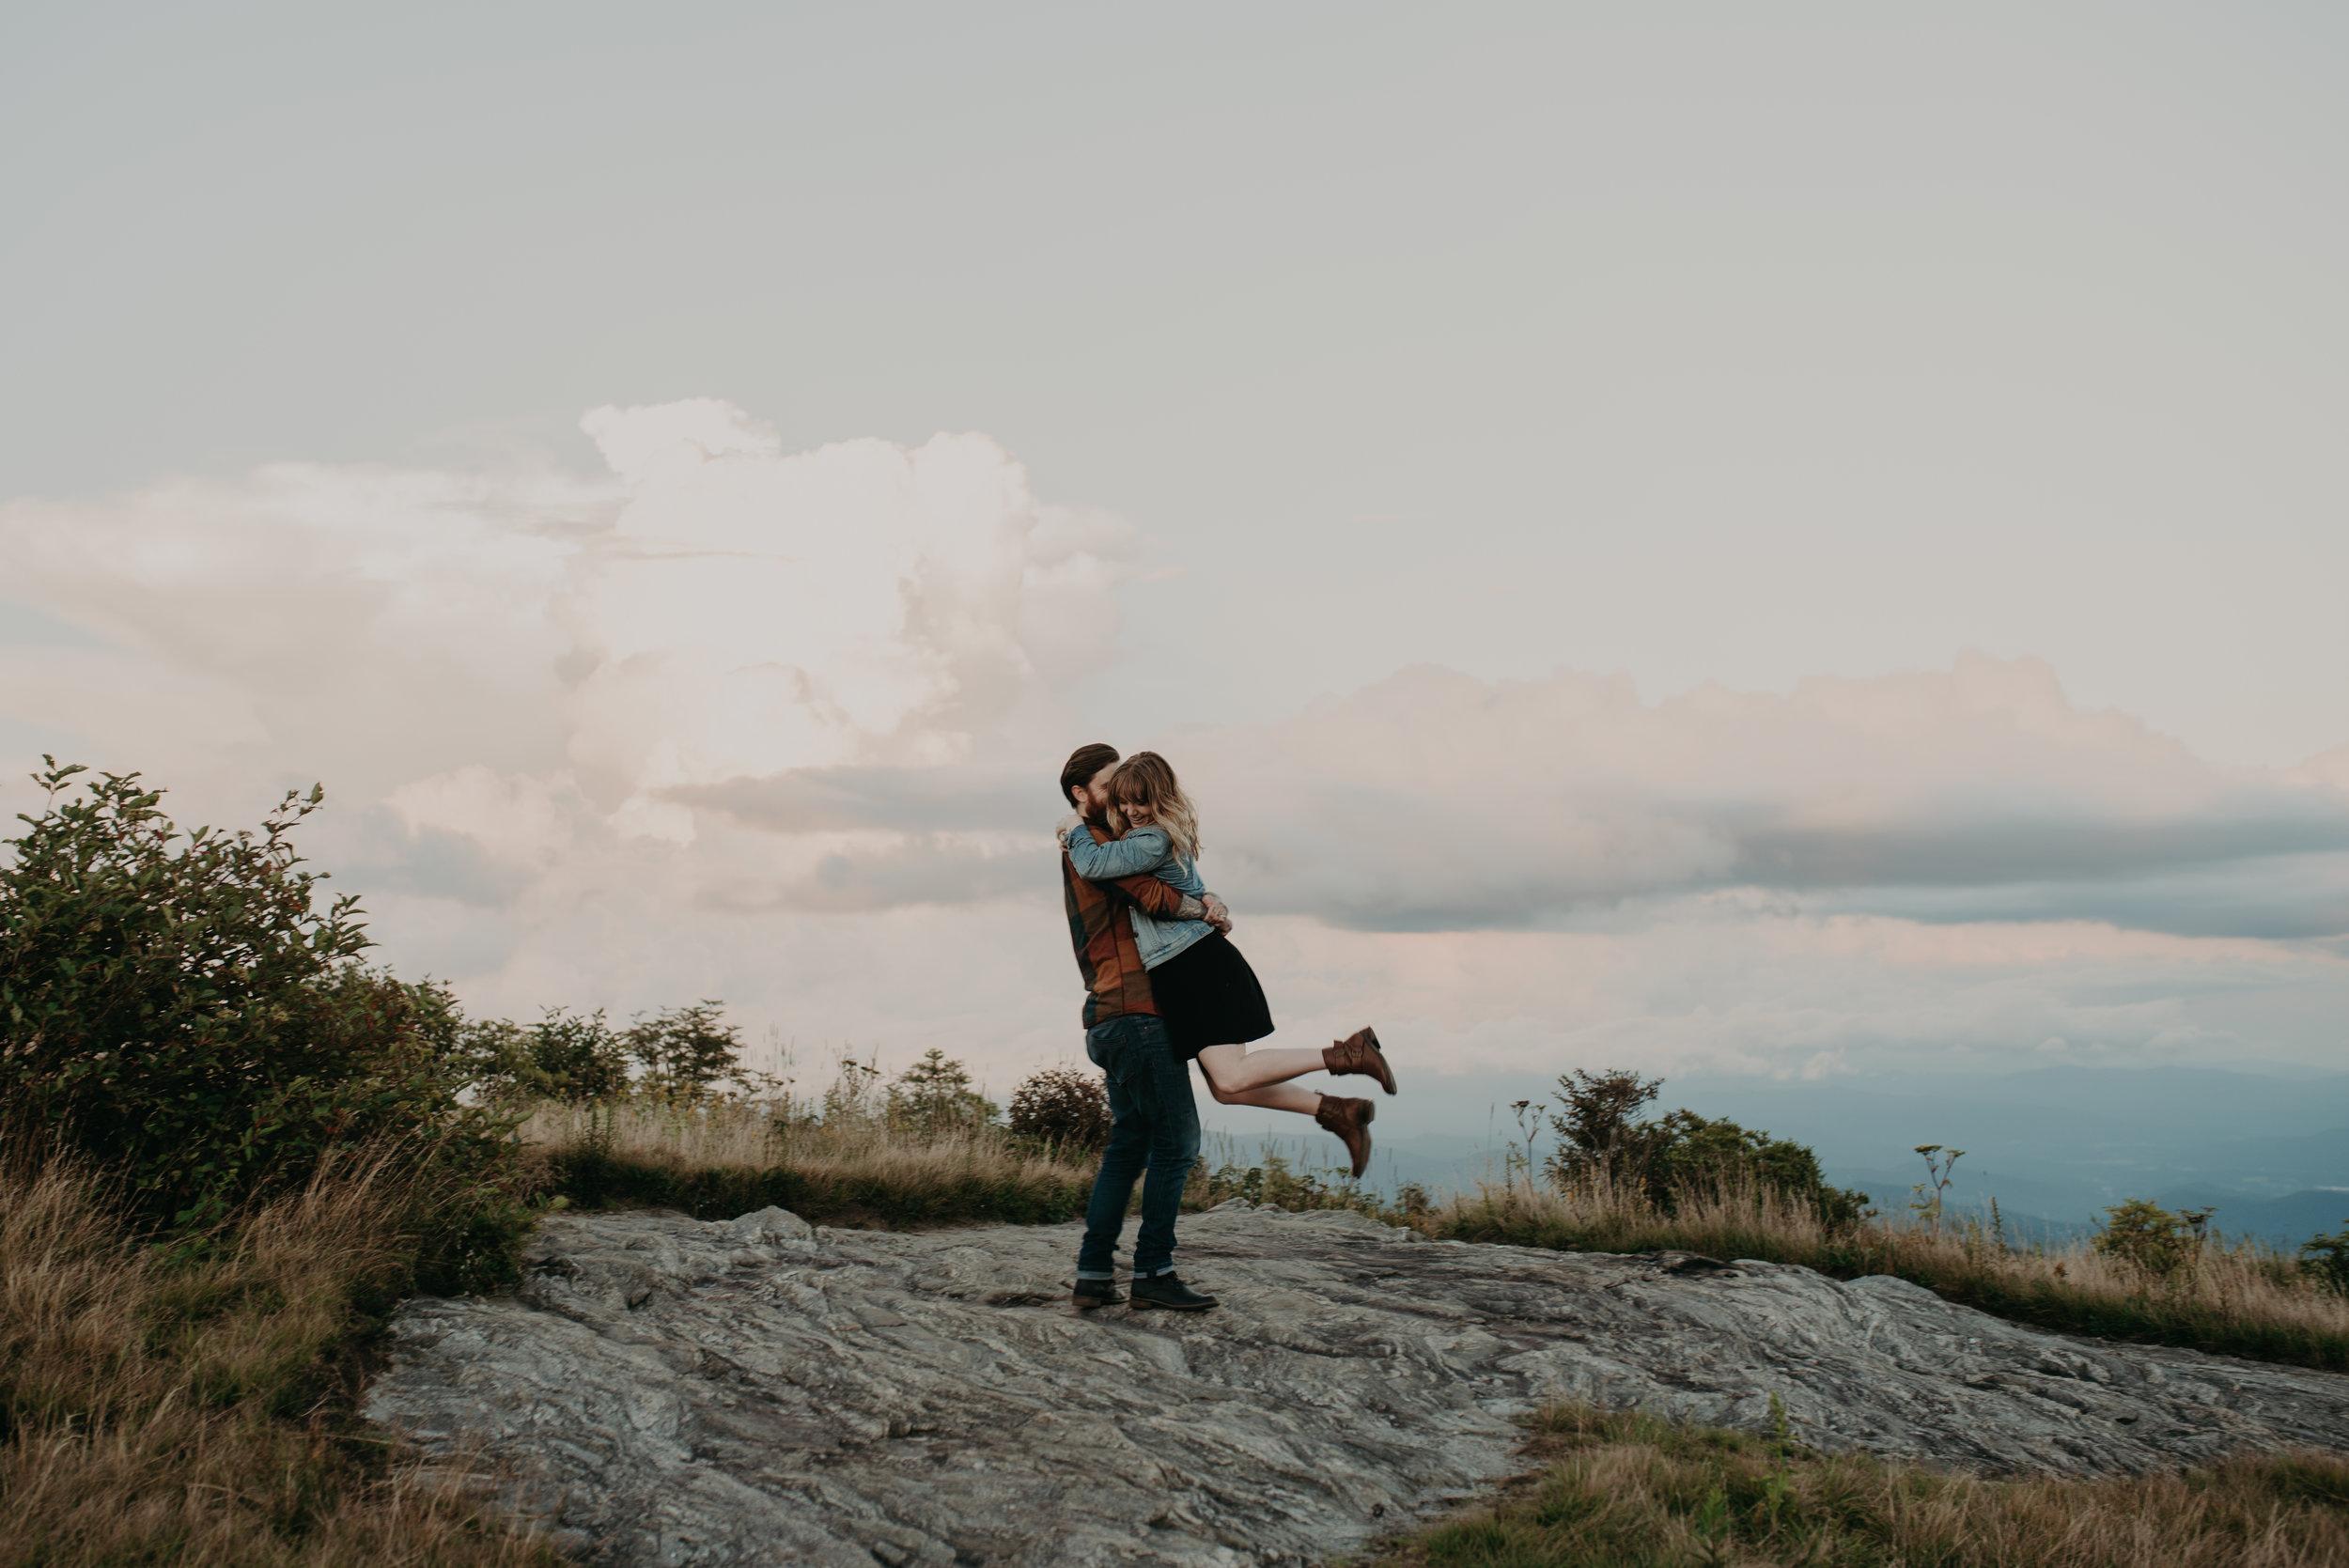 leah-joe-middleton-asheville-north-carolina-couple-session-destination-elopement-photographer-fox-and-film-161.jpg